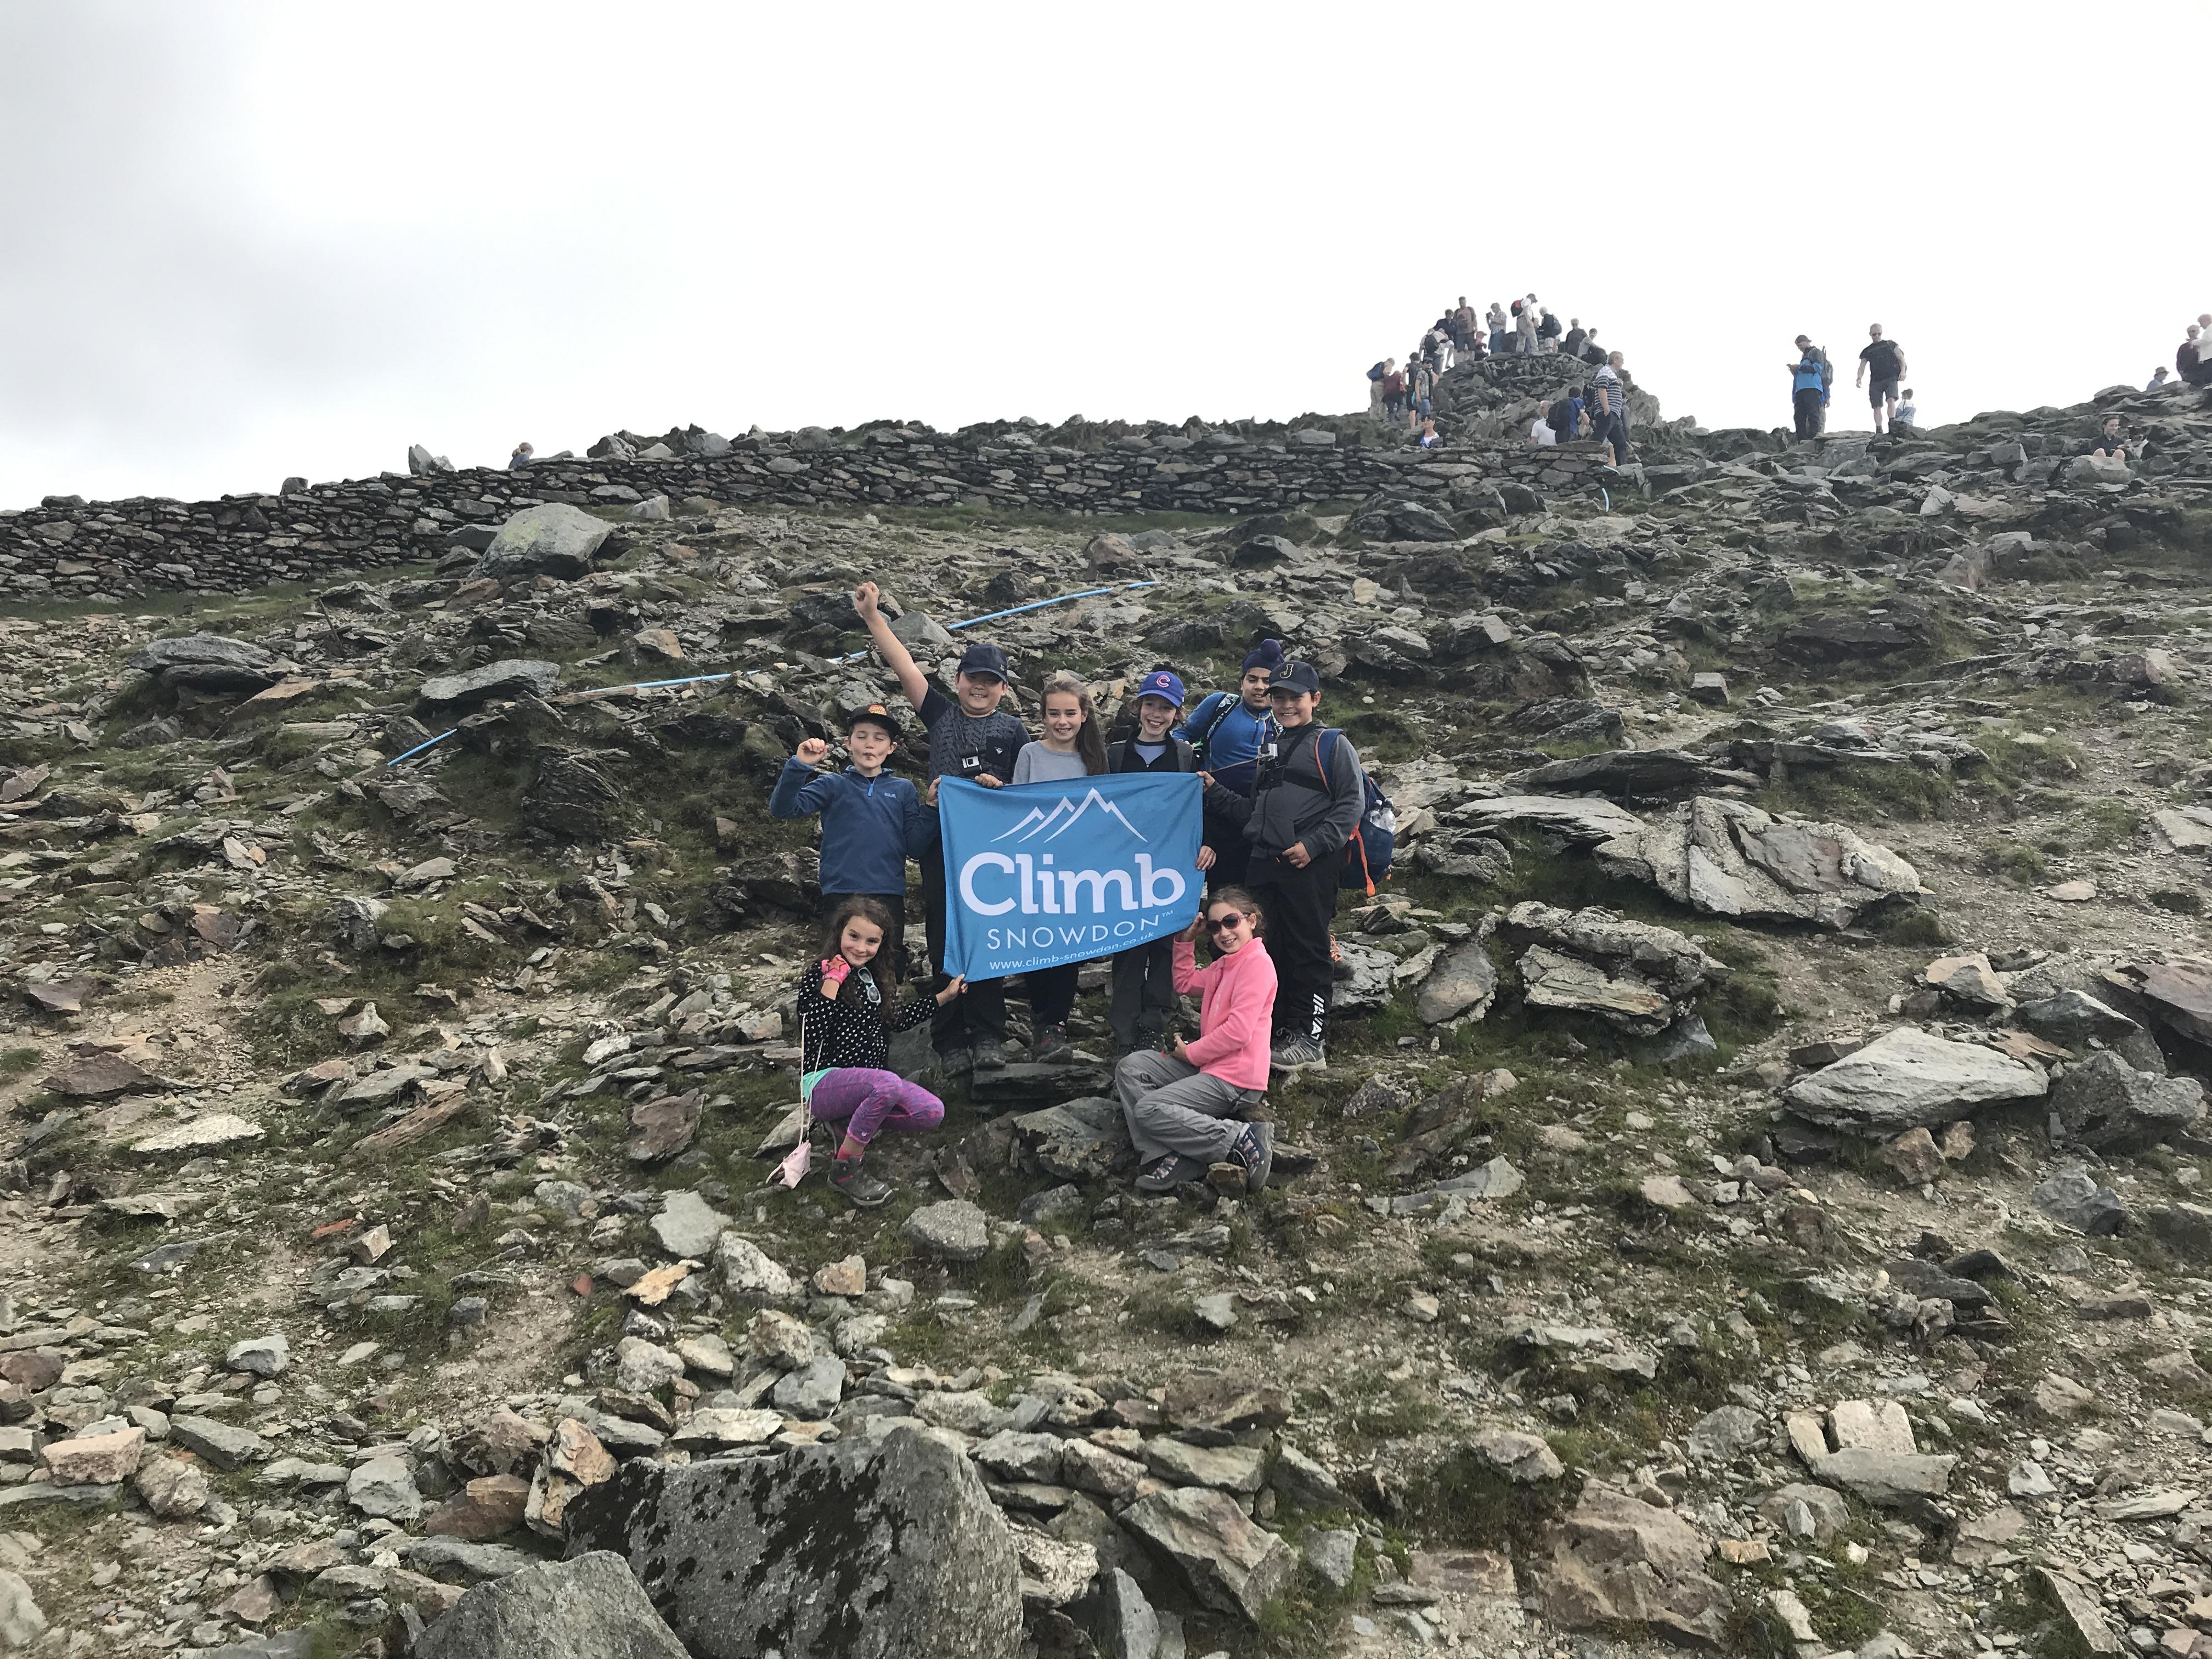 Yr 5 Climb Mount Snowden!